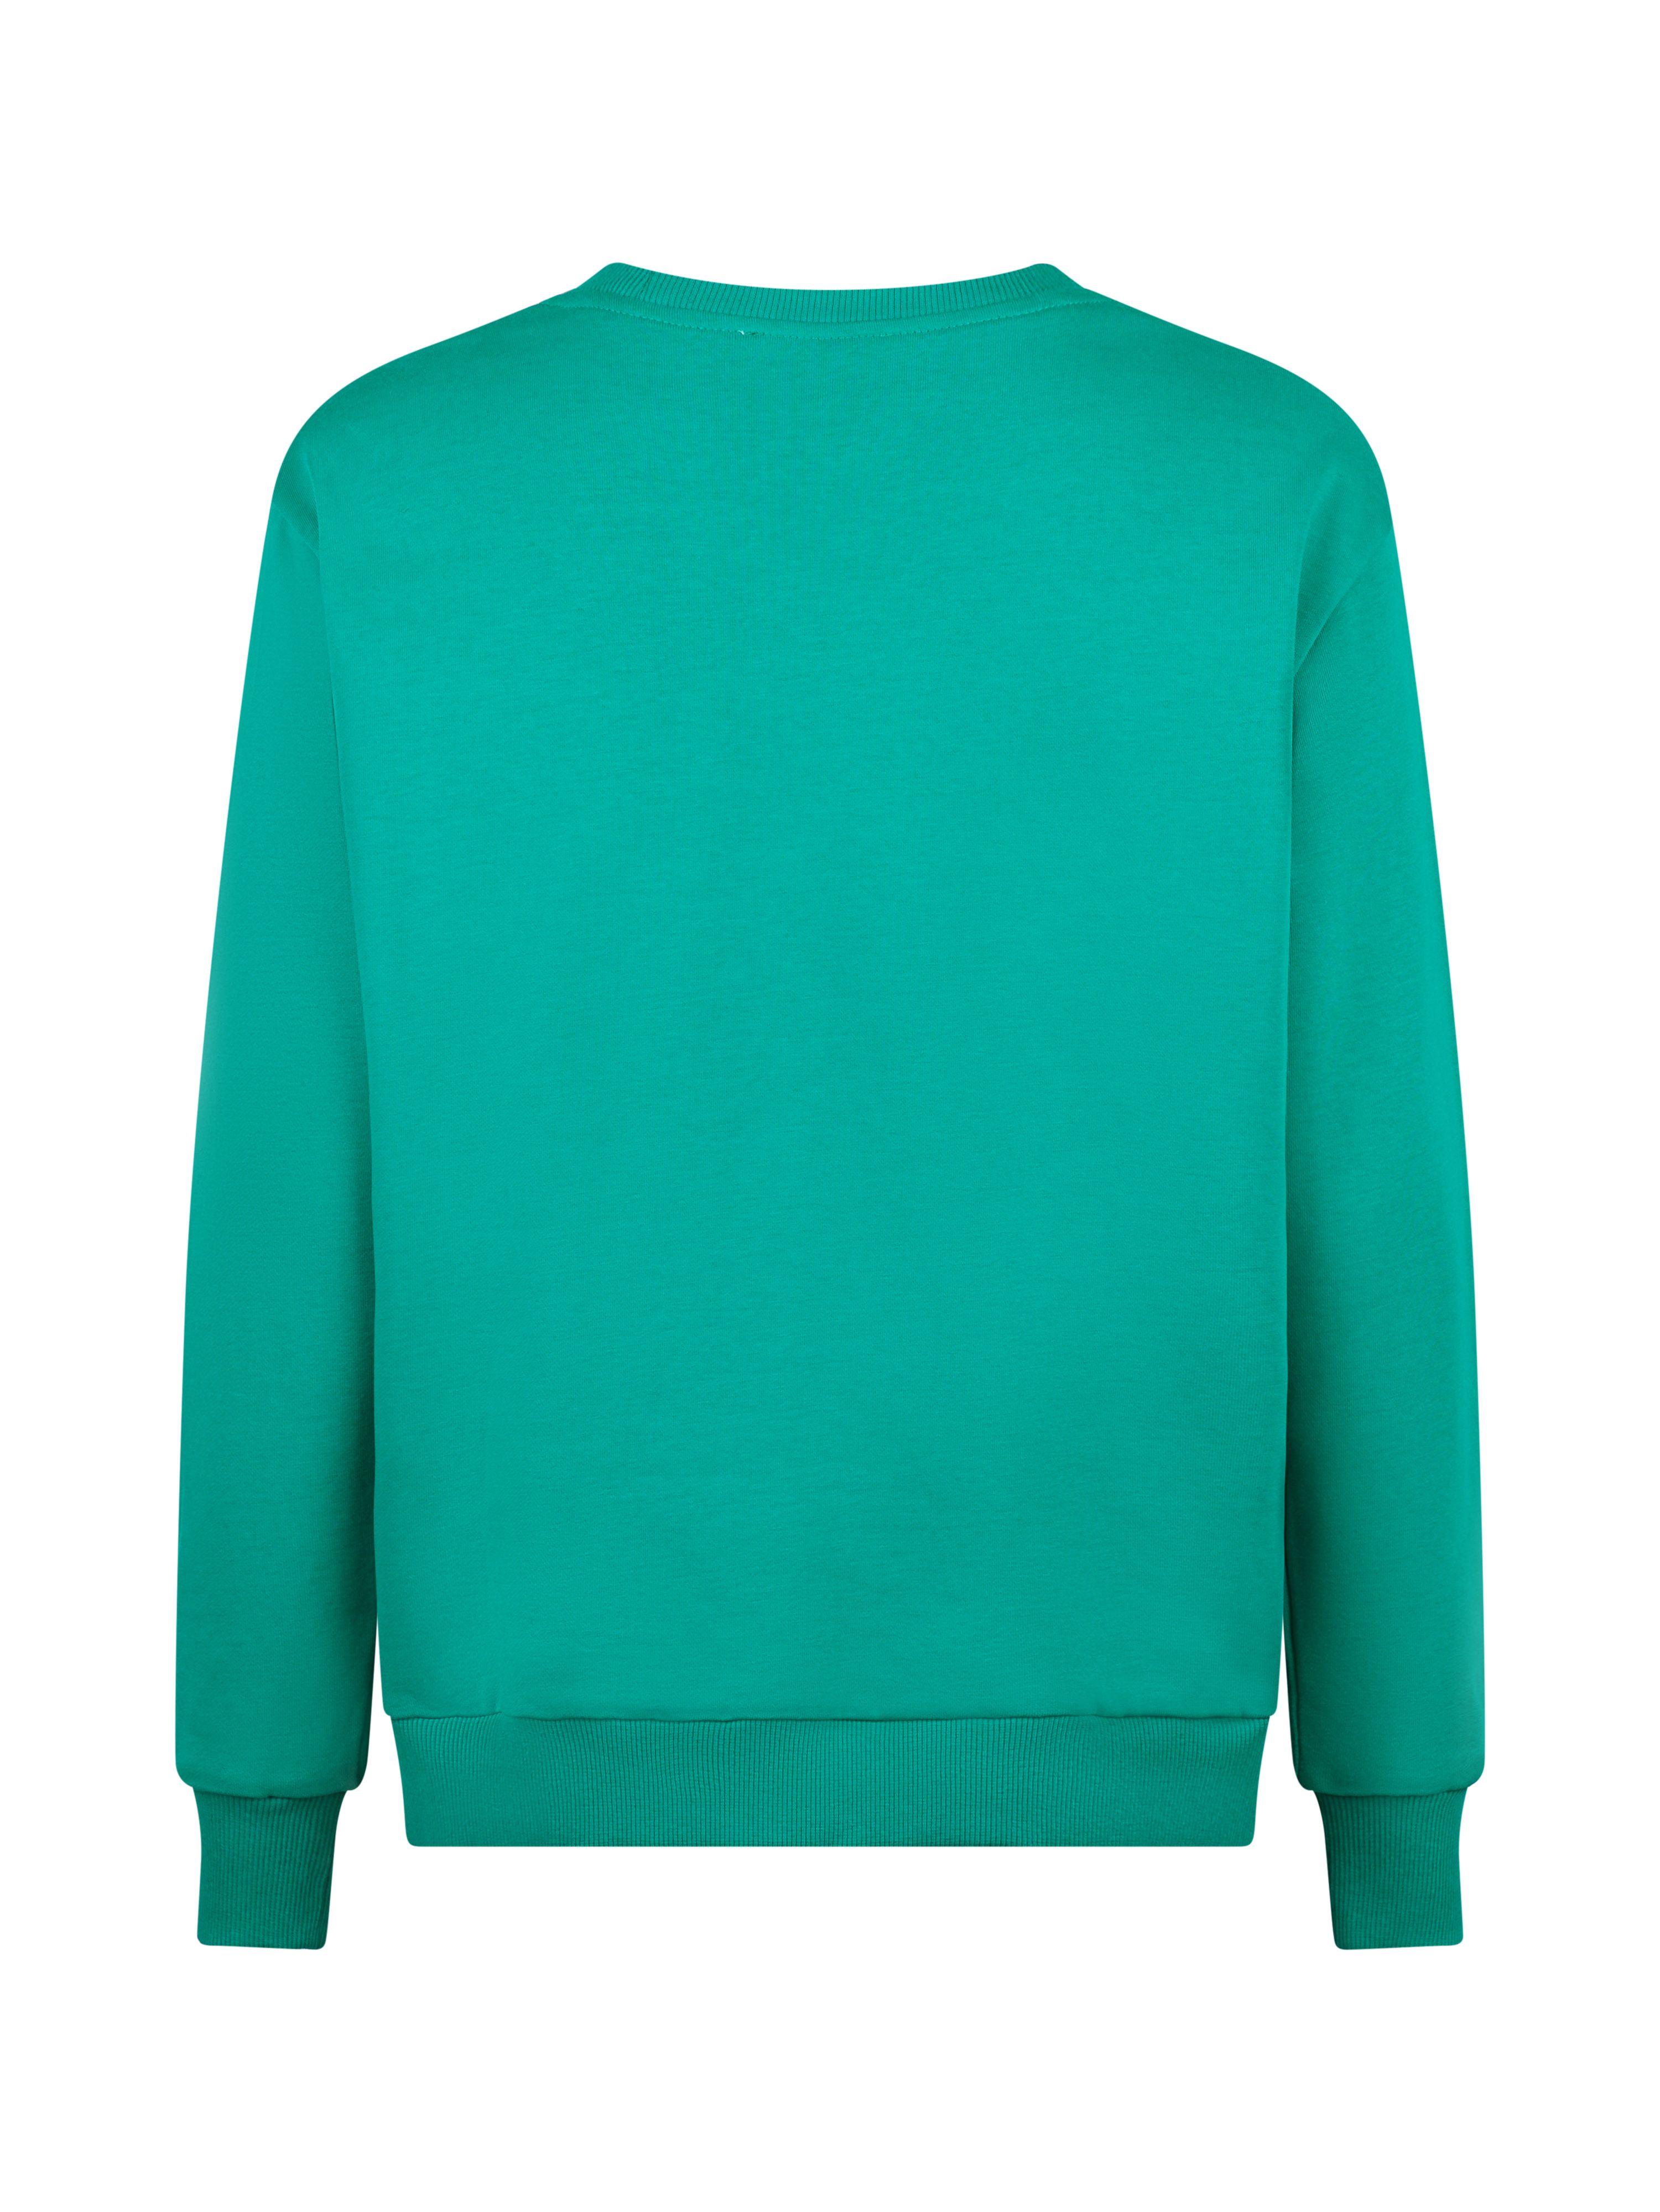 Neo Noir Flex Varsity sweatshirt, green, 40